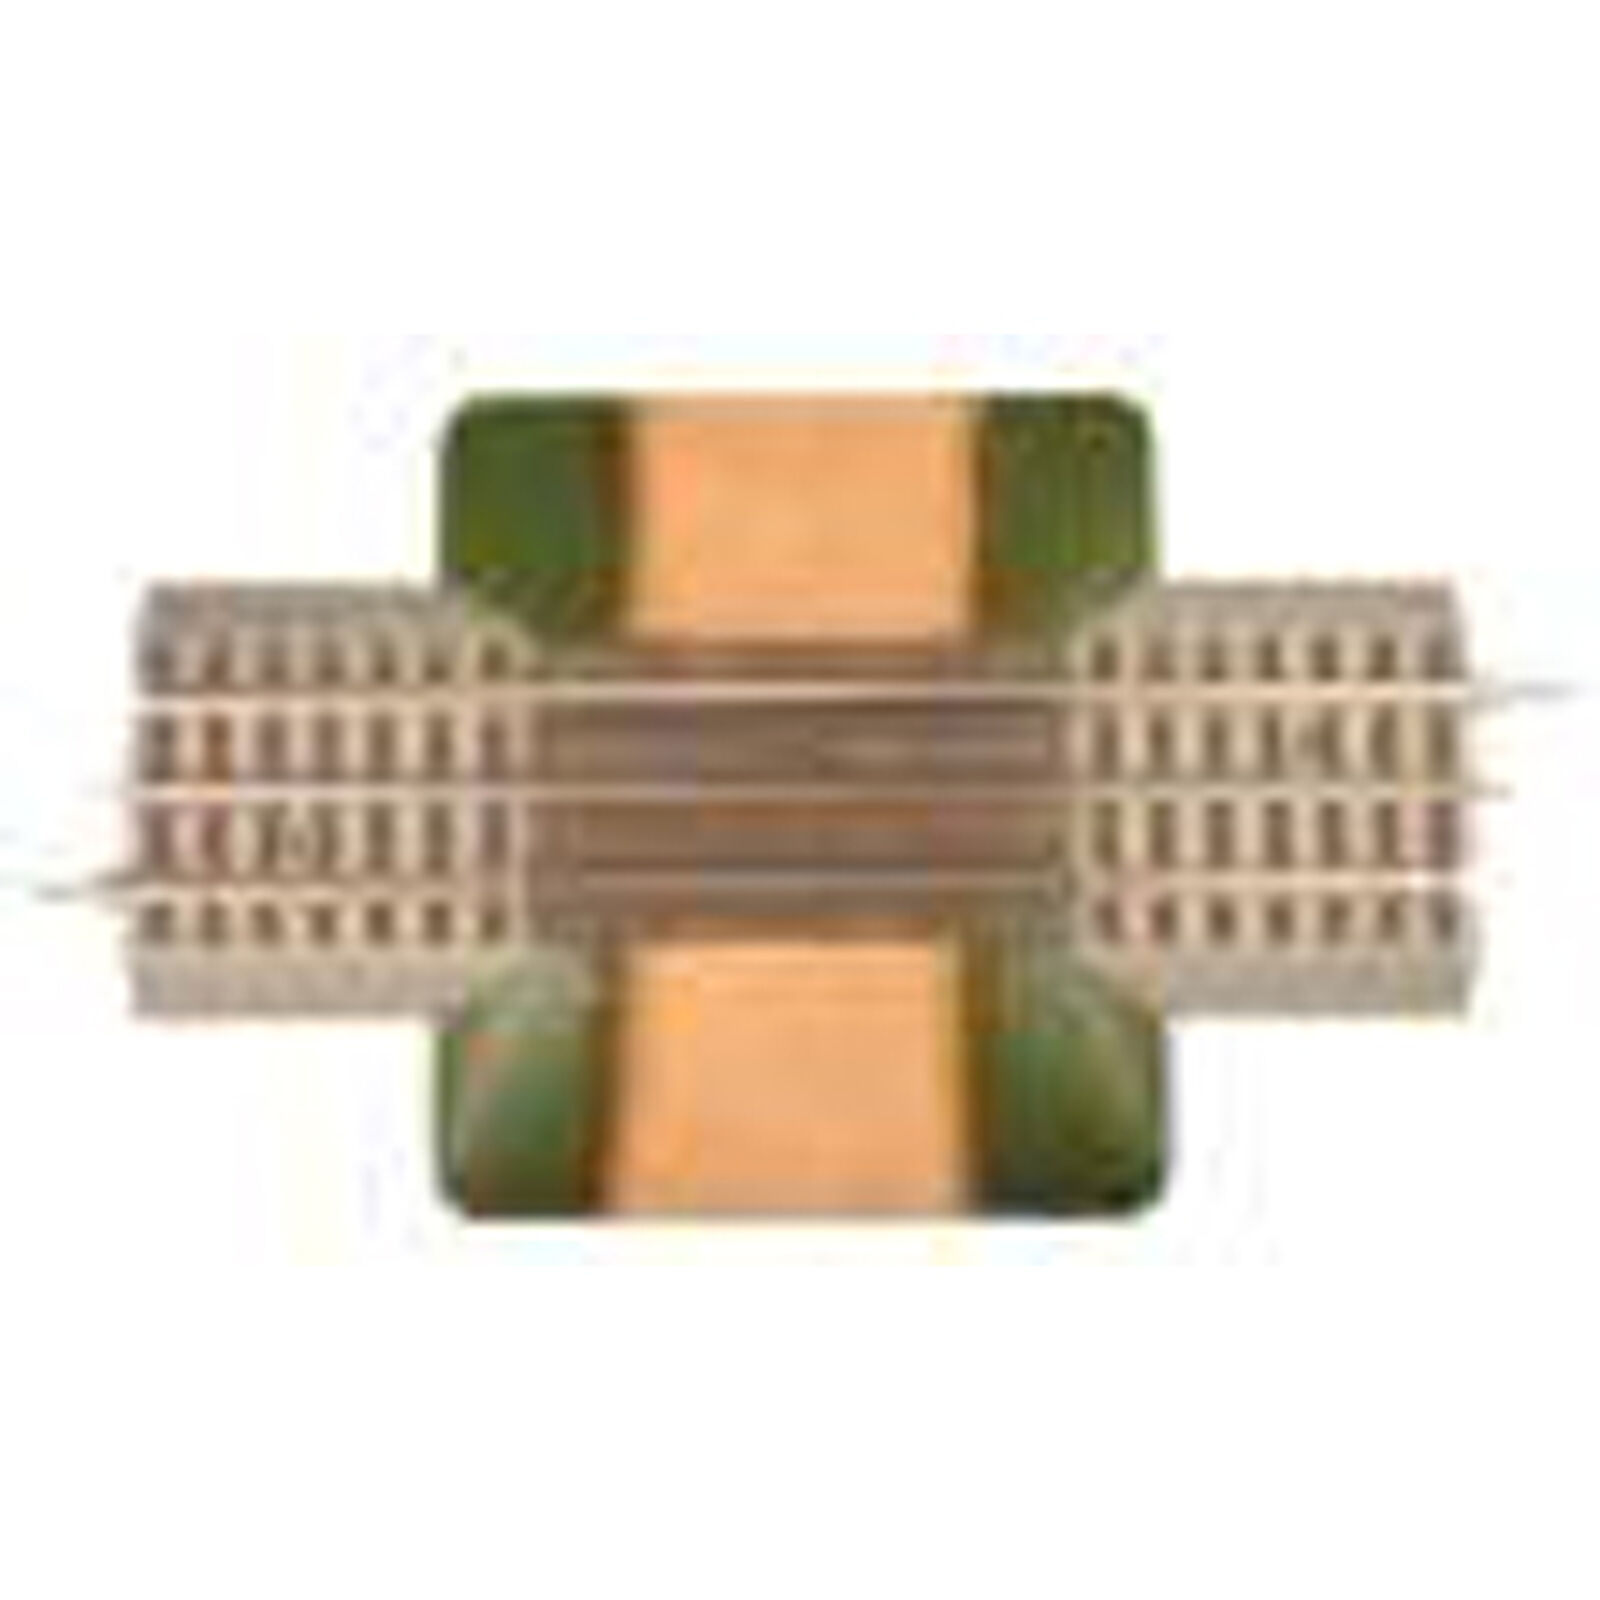 Lionel FasTrack Grade Crossing (2 pack) - 612036